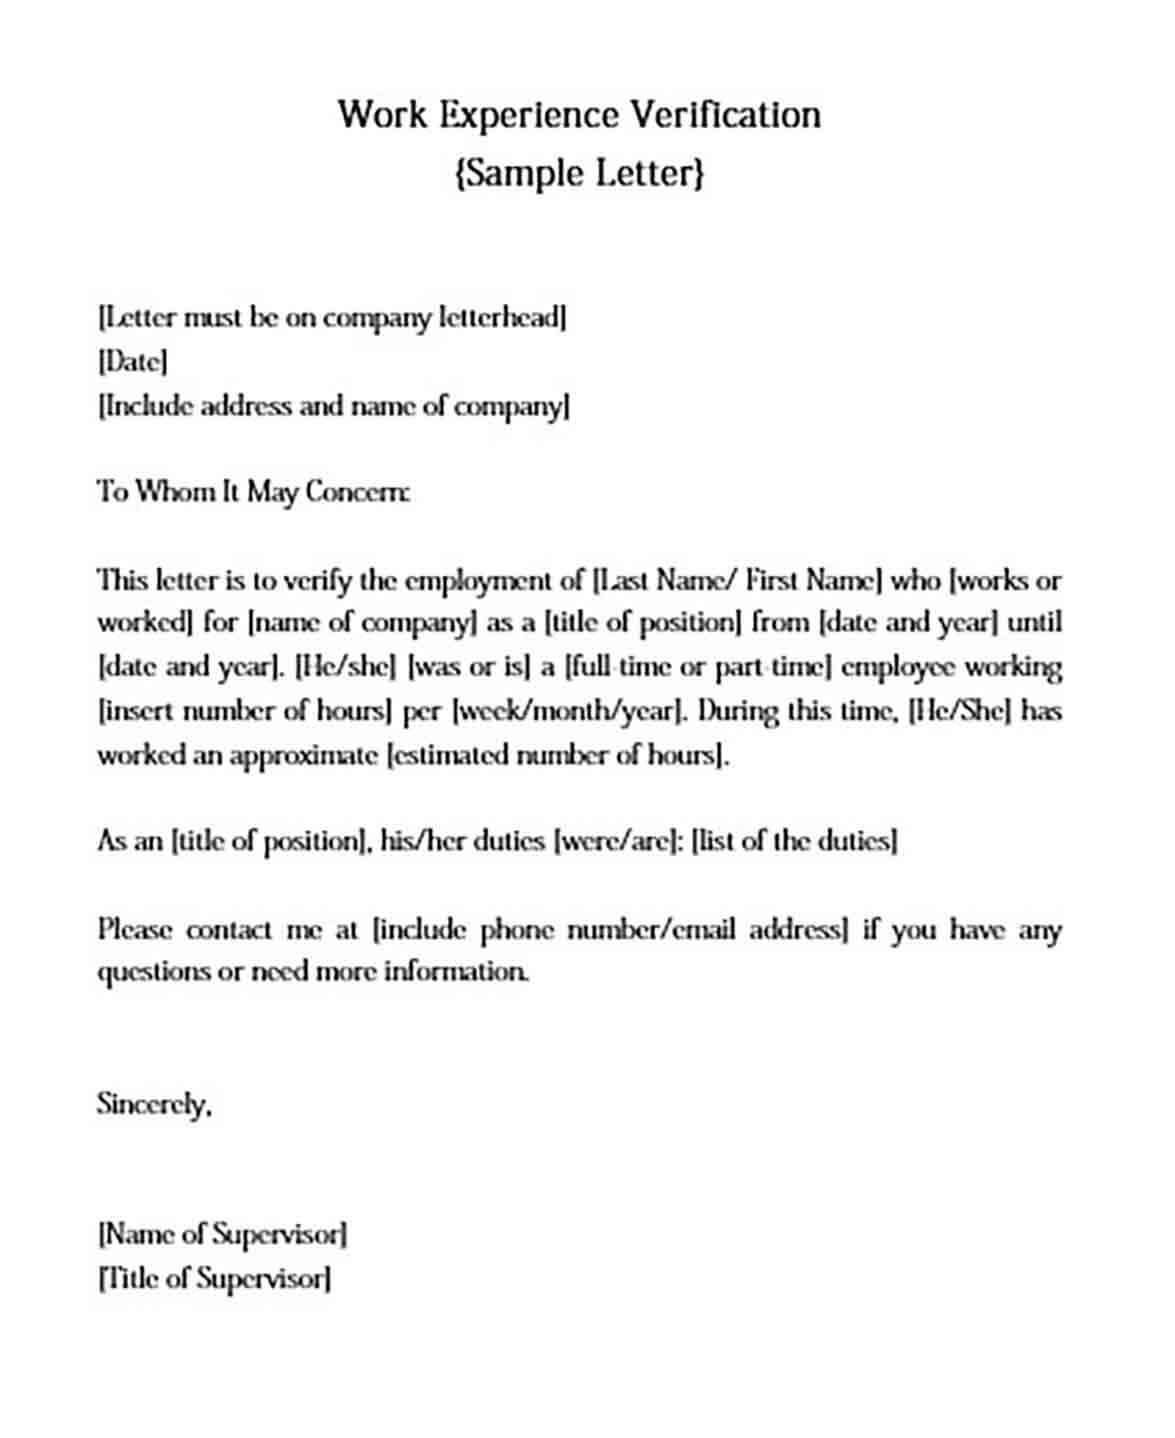 Employee Work Verification Letter